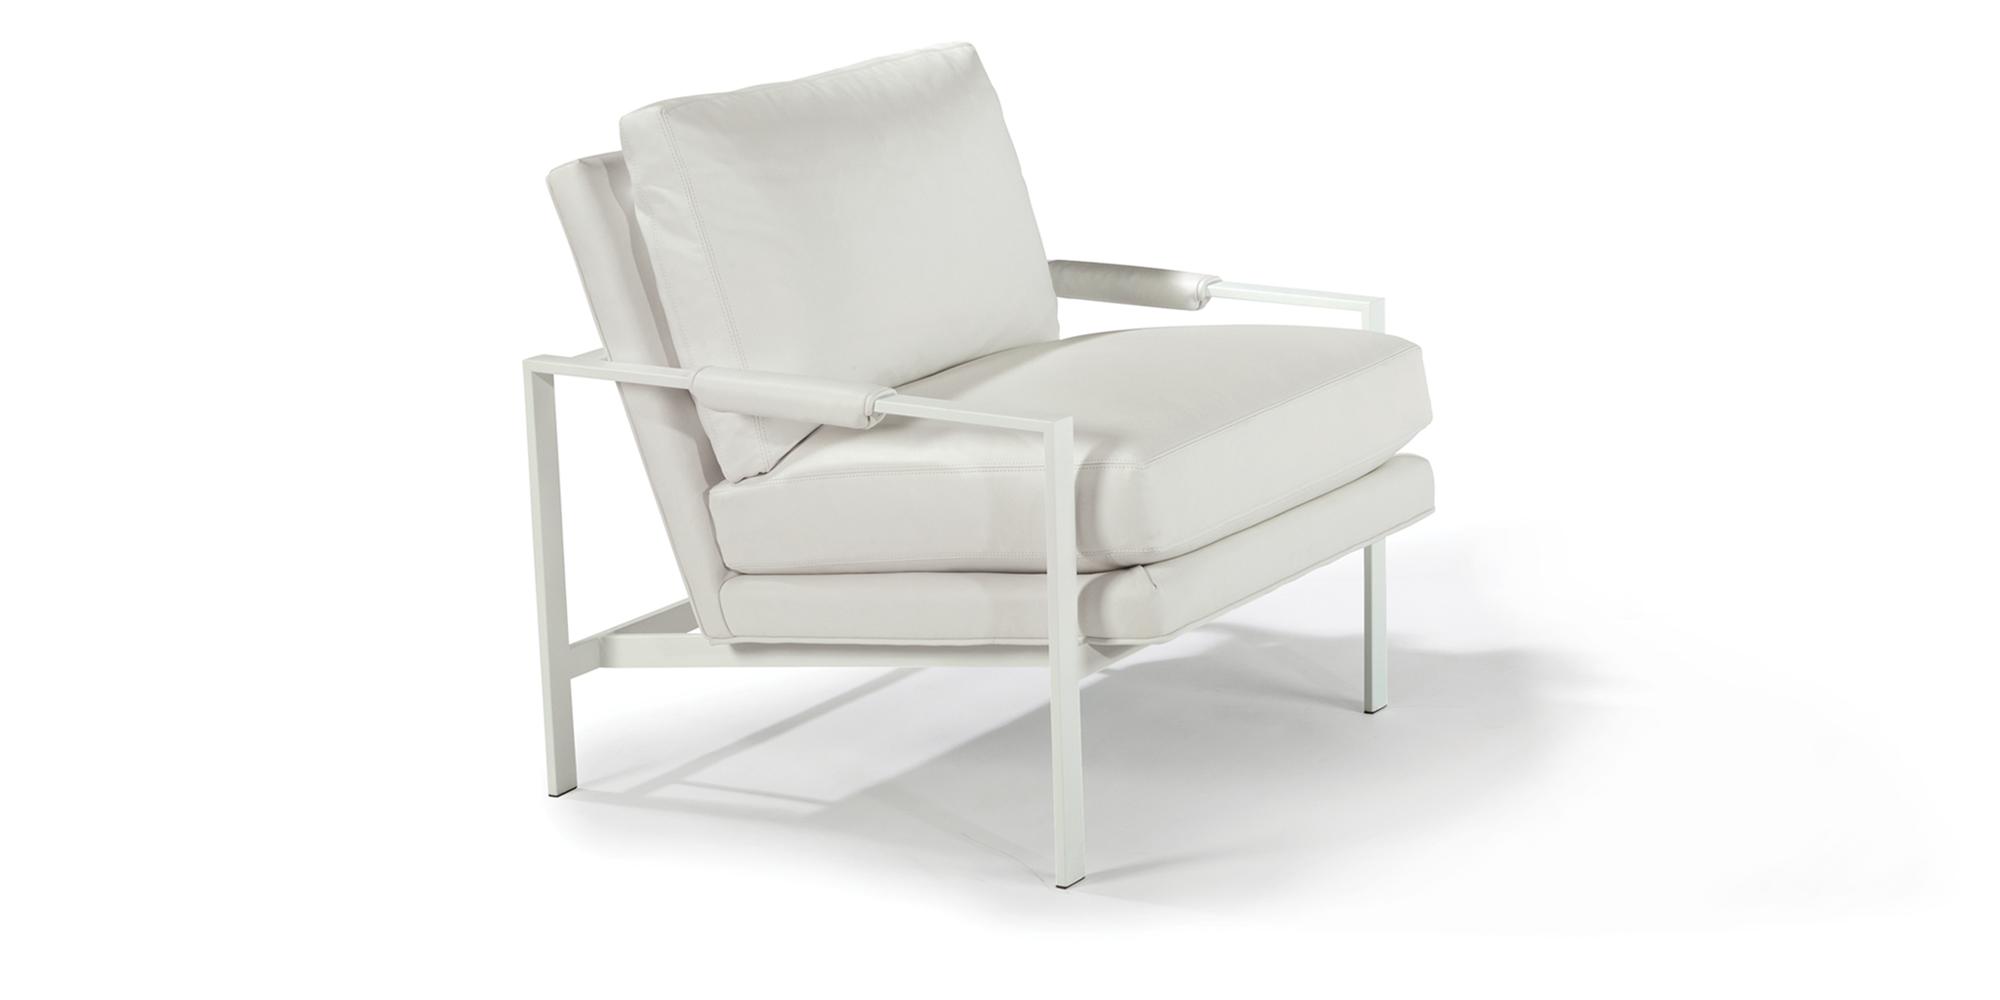 951 Design Classic Chair (White Powder Coat)